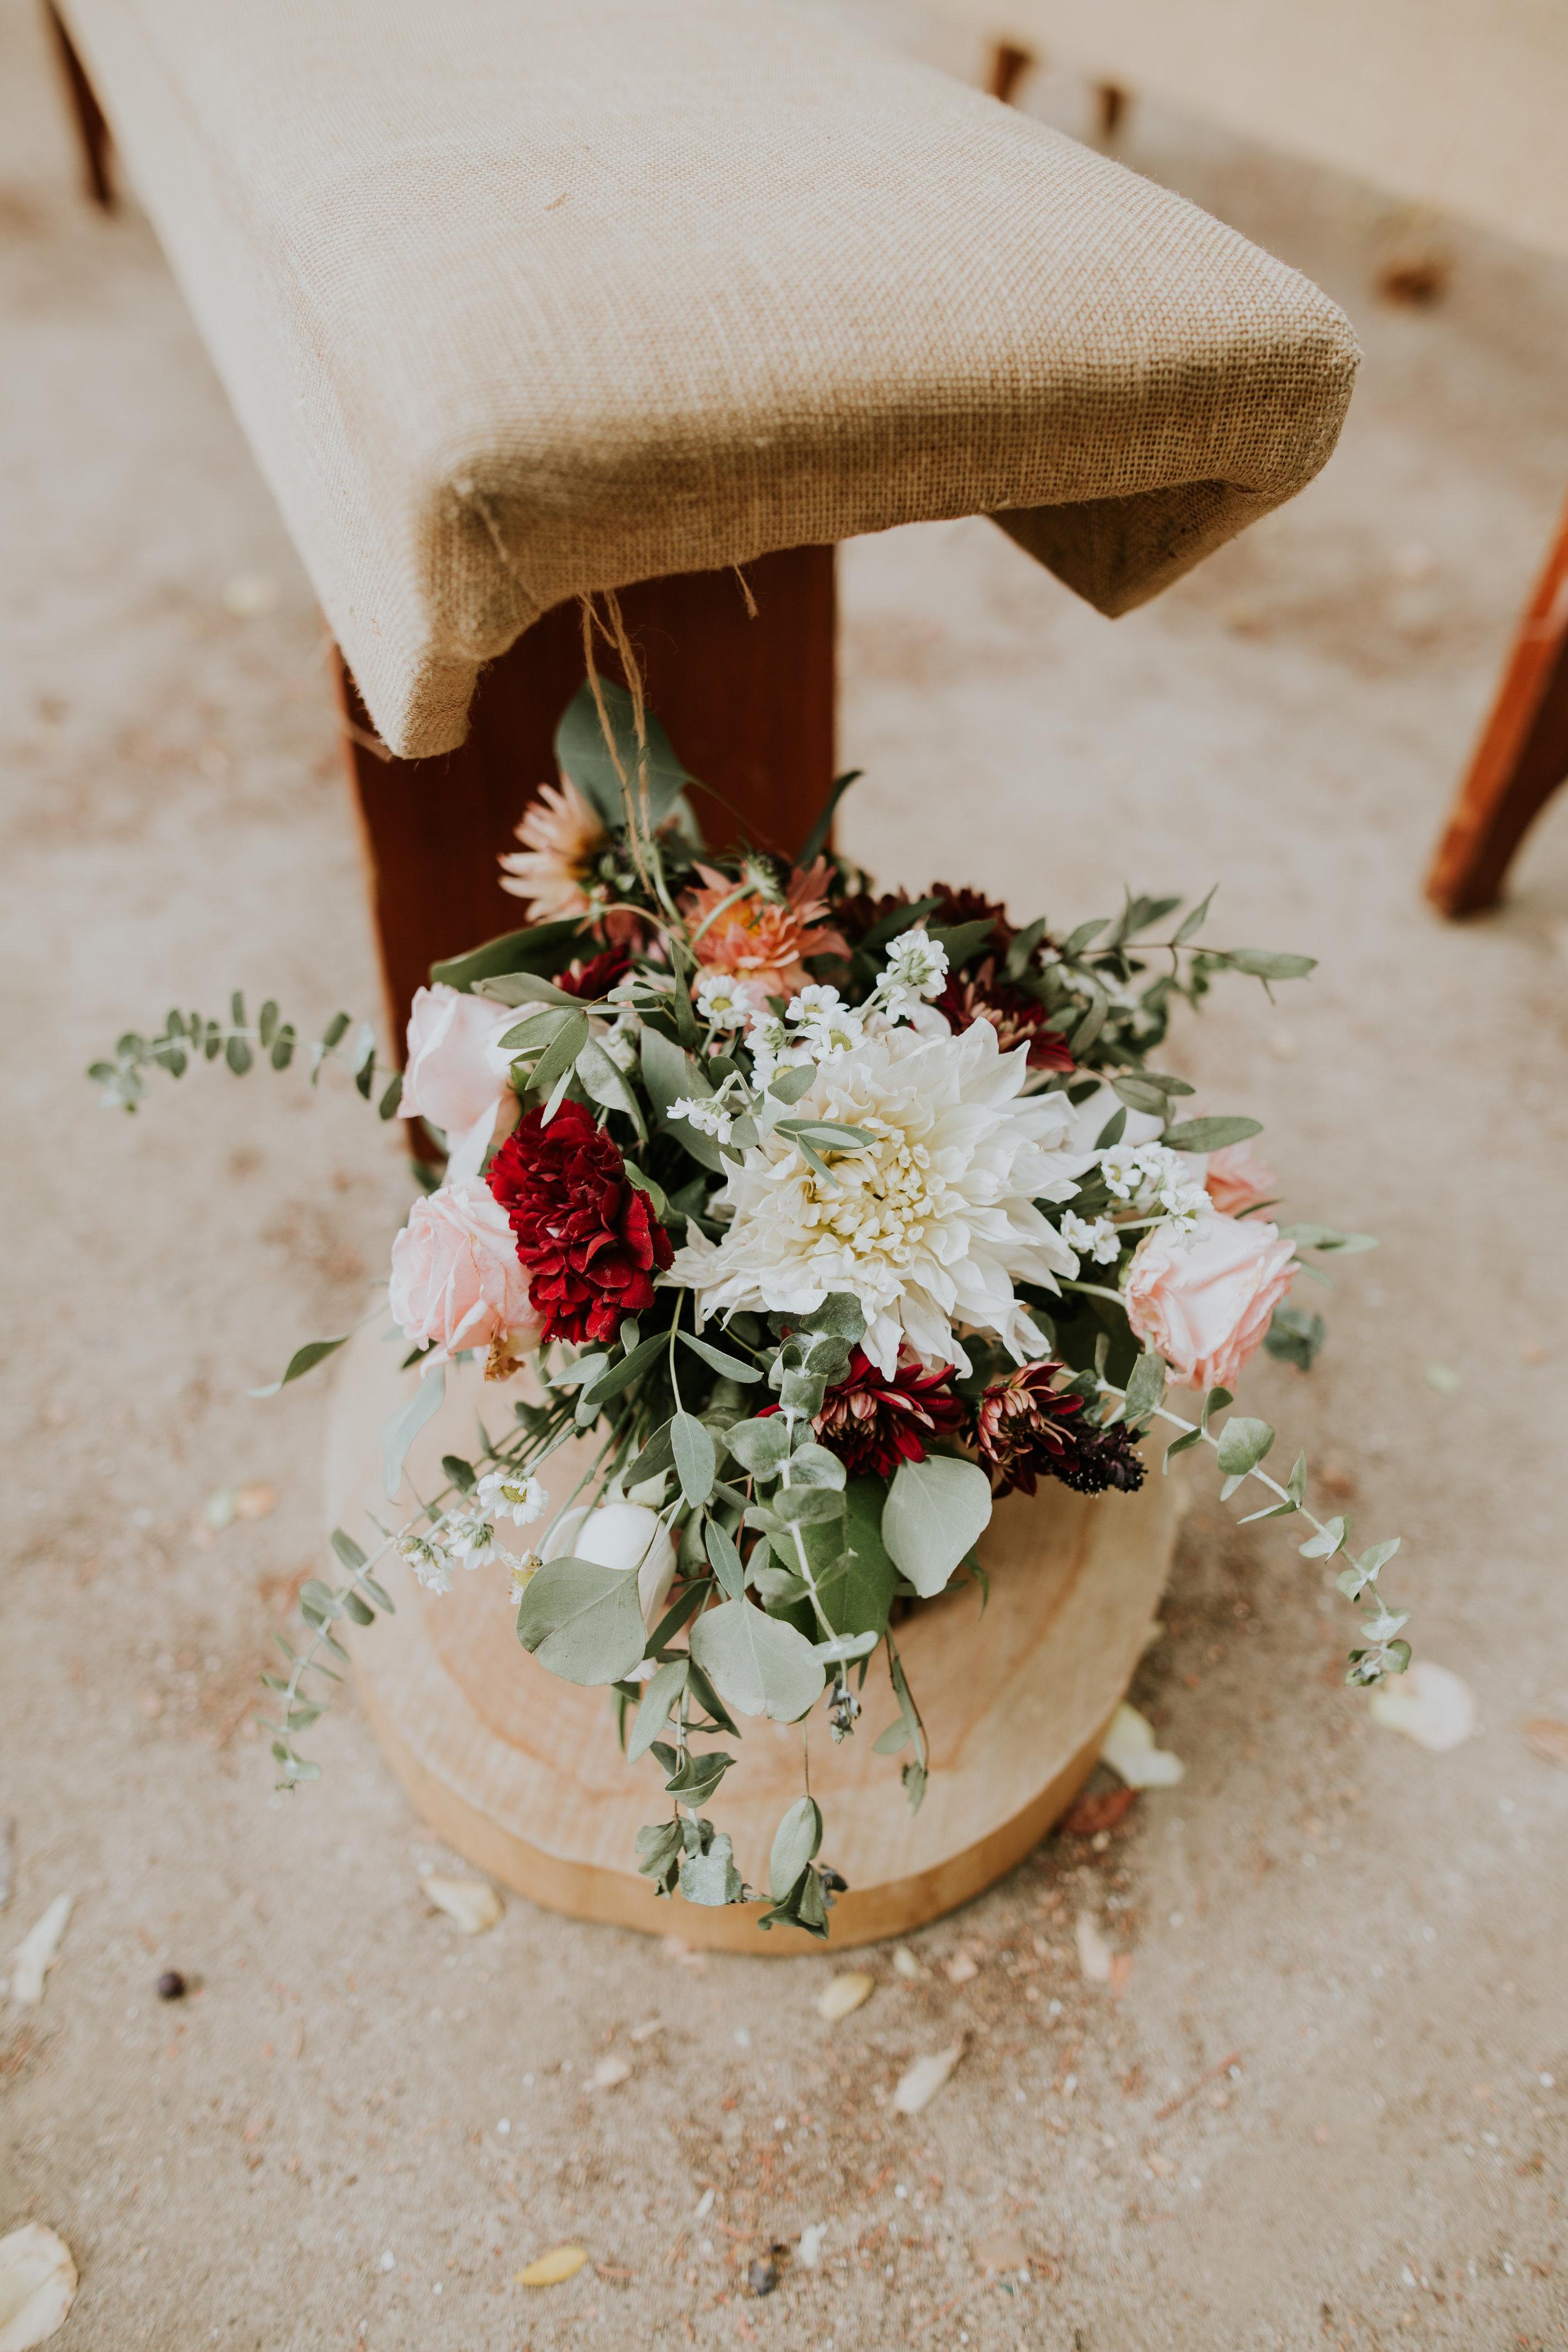 R&J130_ 09 setembro 2017 Wedding day_.jpg